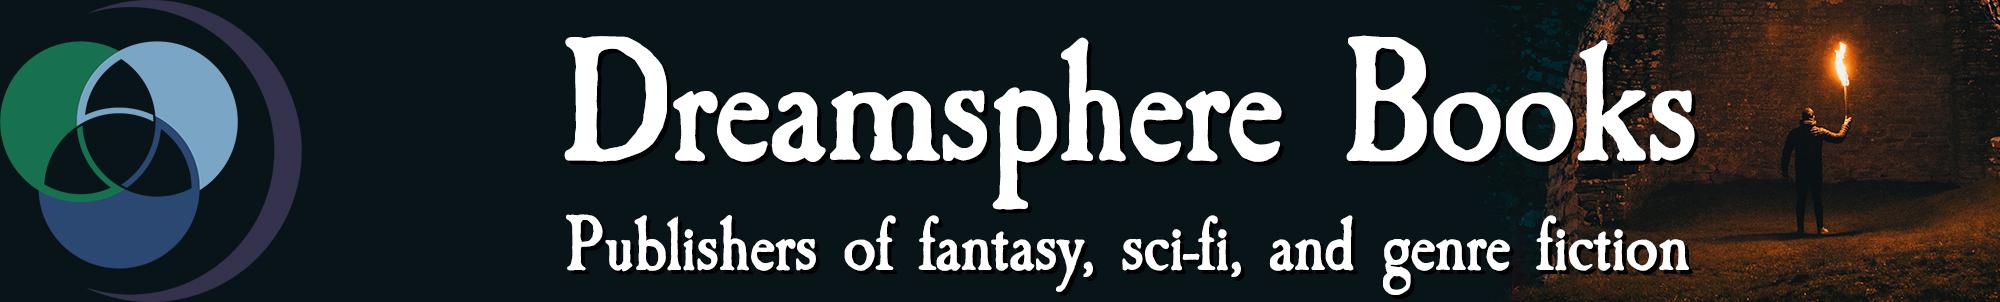 Dreamsphere Books